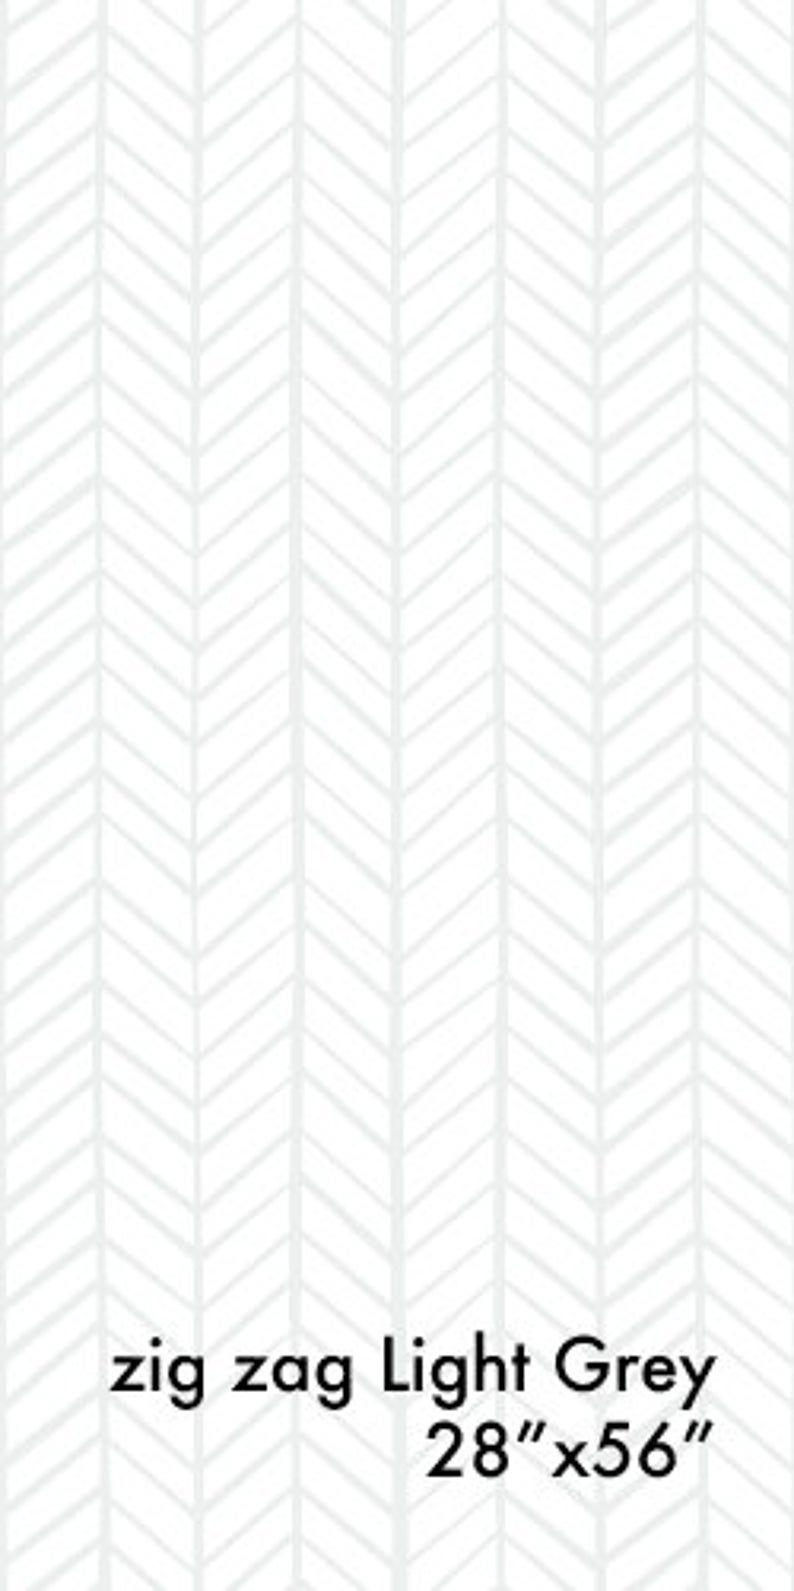 Removable Wallpaper Peel And Stick Herringbone Wallpaper Grey Wallpaper Mural Wallpaper Nursery Decor Self Adhesive Herringbone Wallpaper Grey Wallpaper Peel And Stick Wallpaper